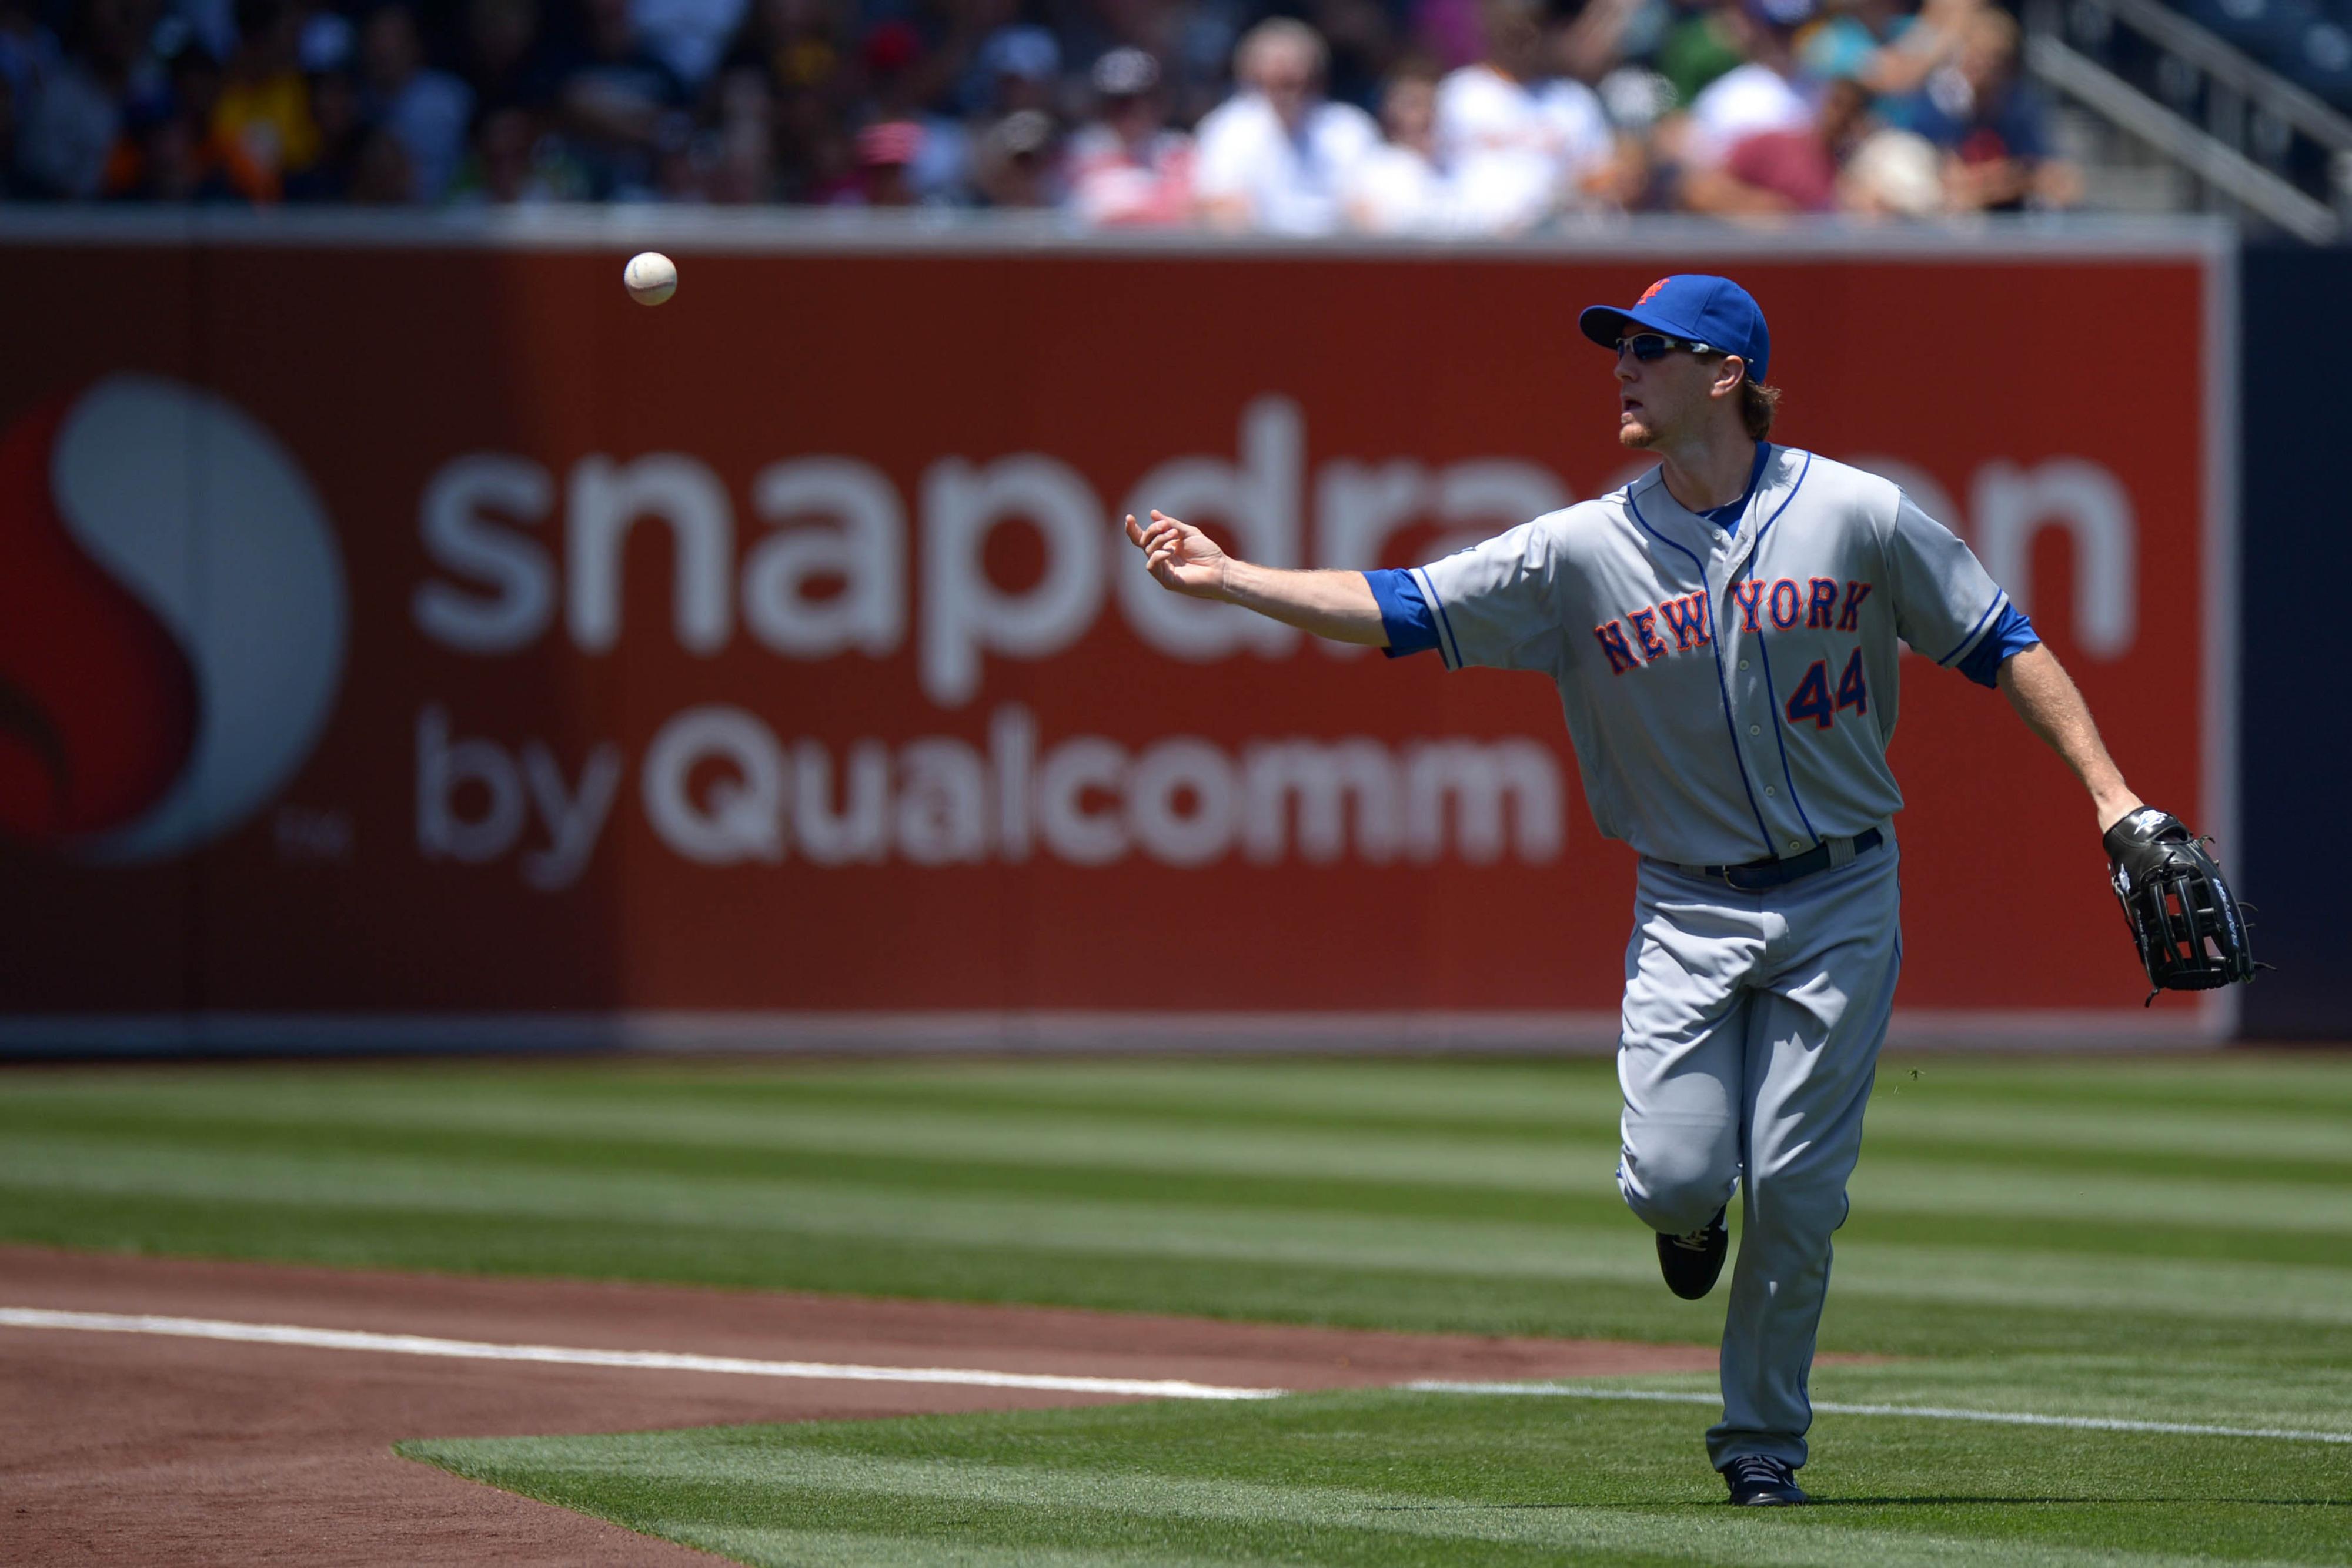 Jason Bay, Mets savior